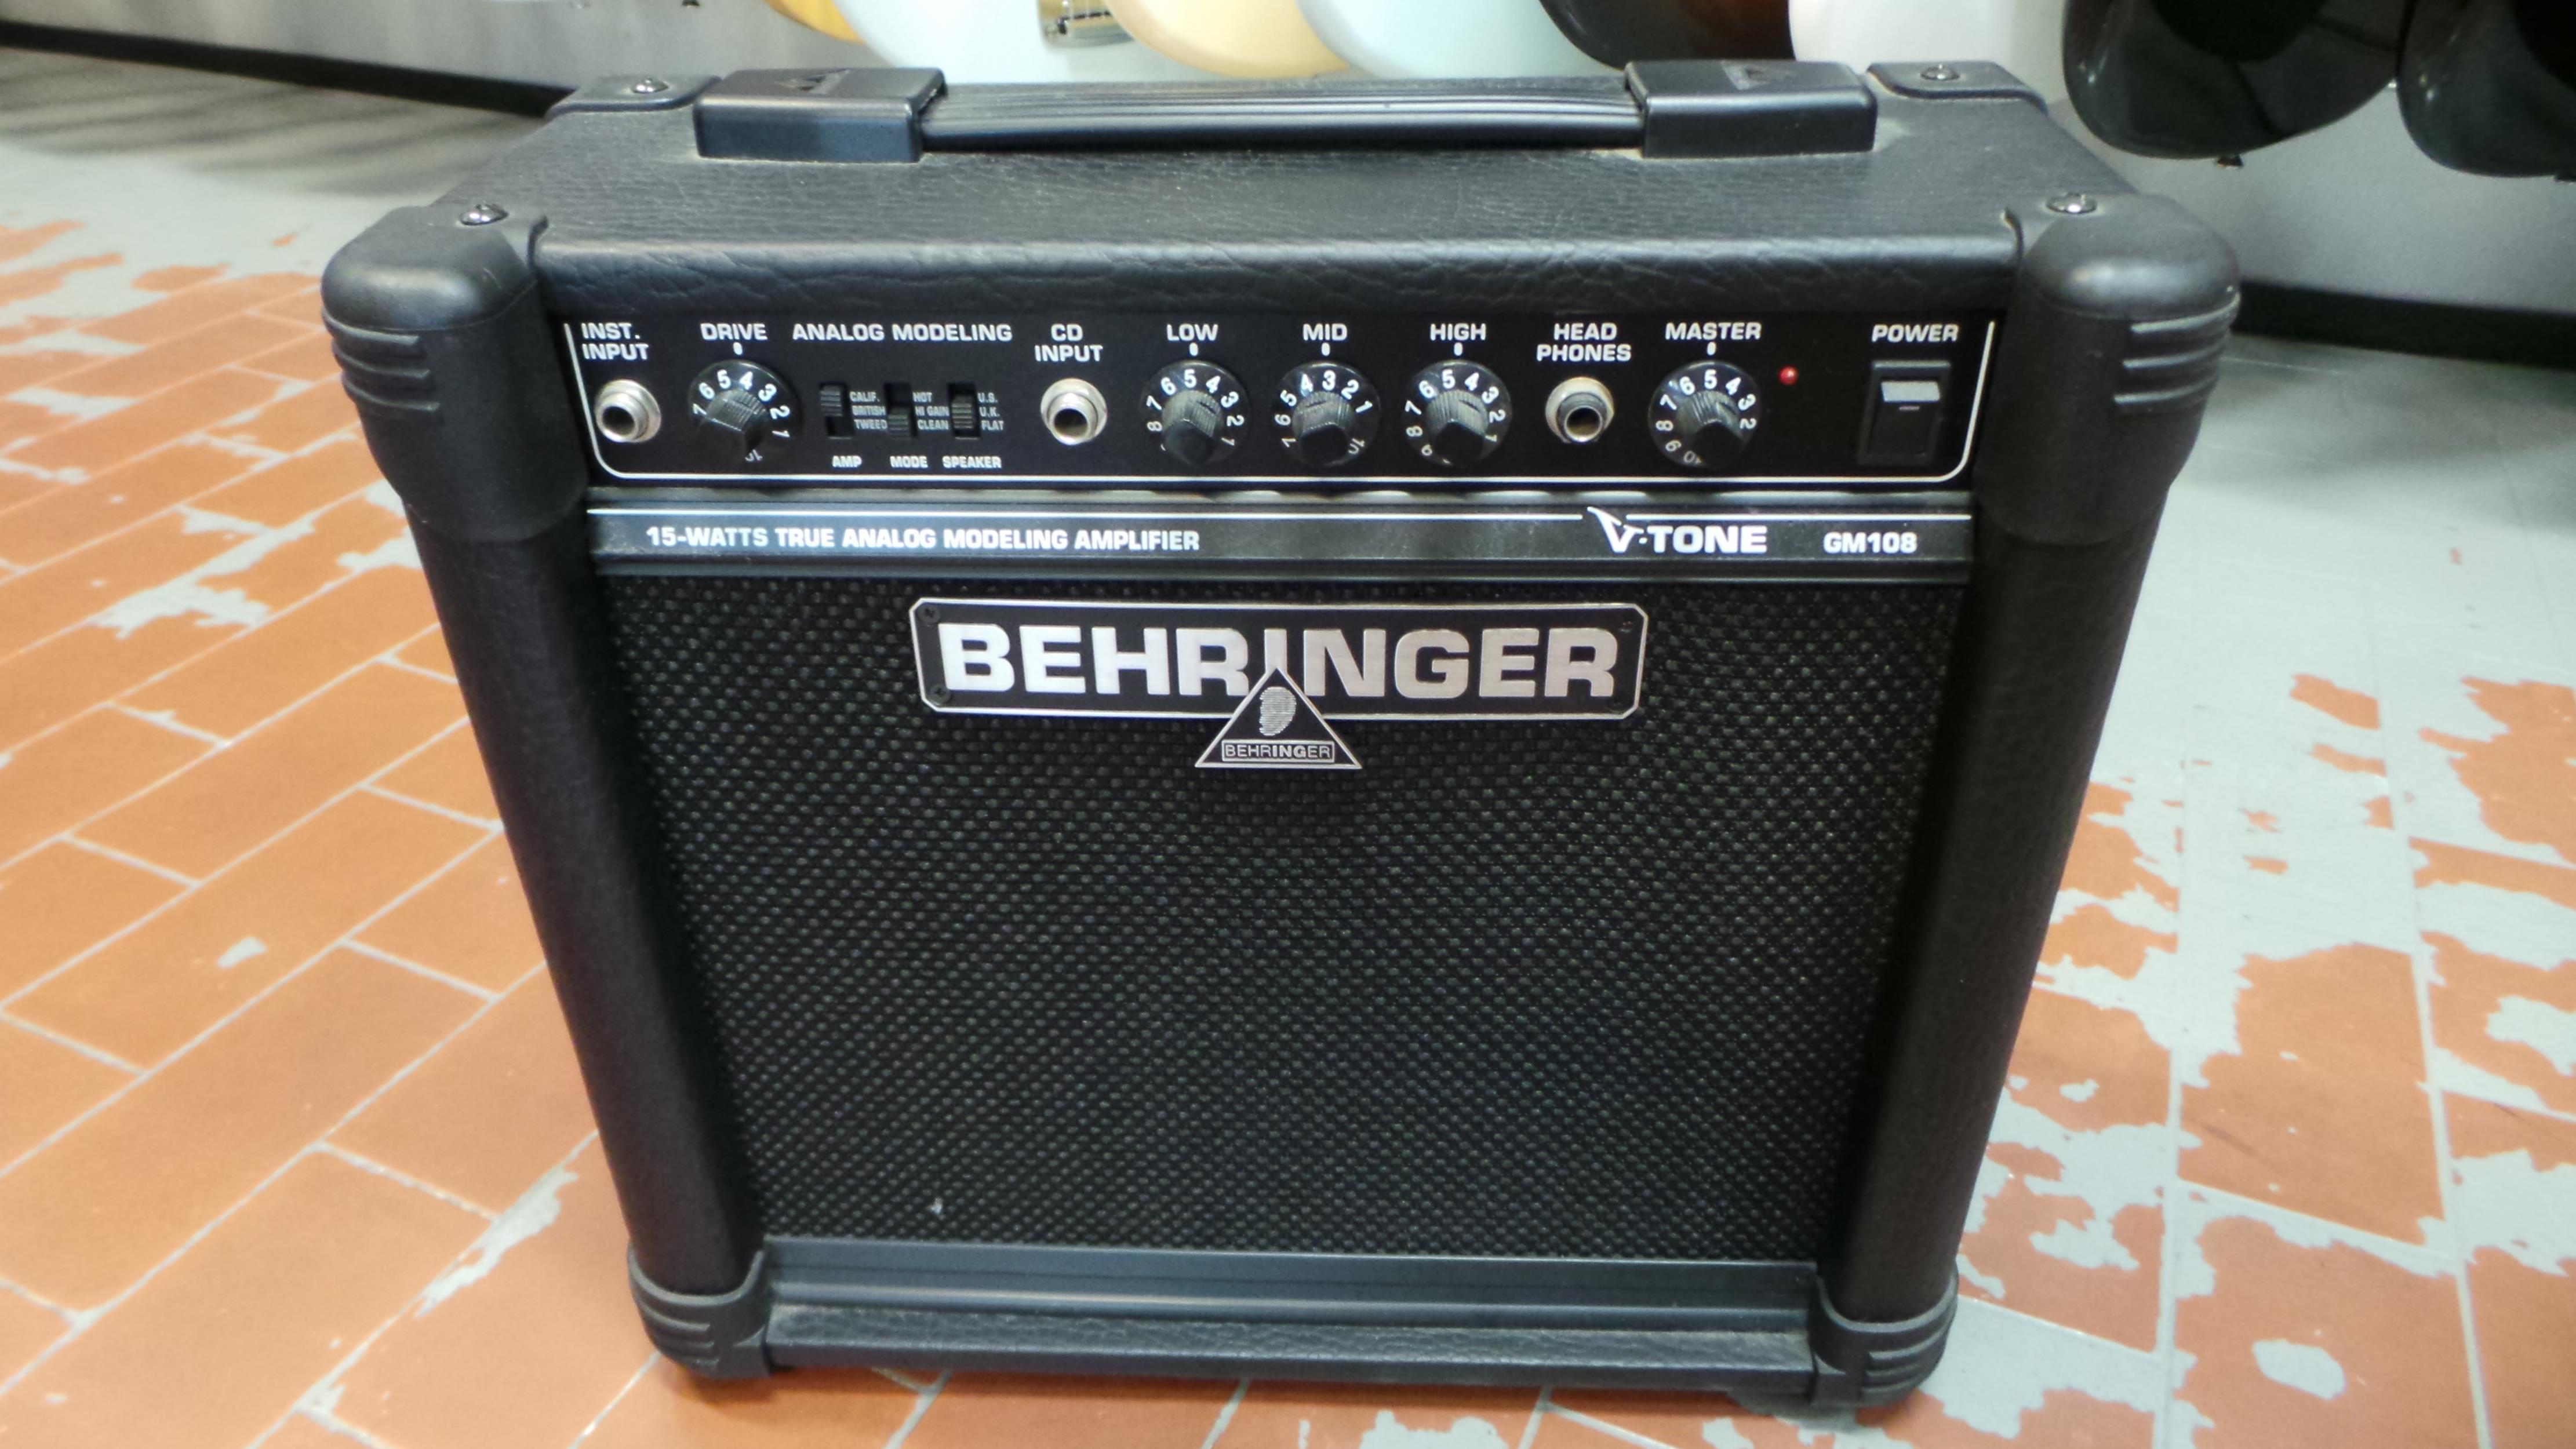 BEHRINGER COMBO MINI gm 108 v tone .